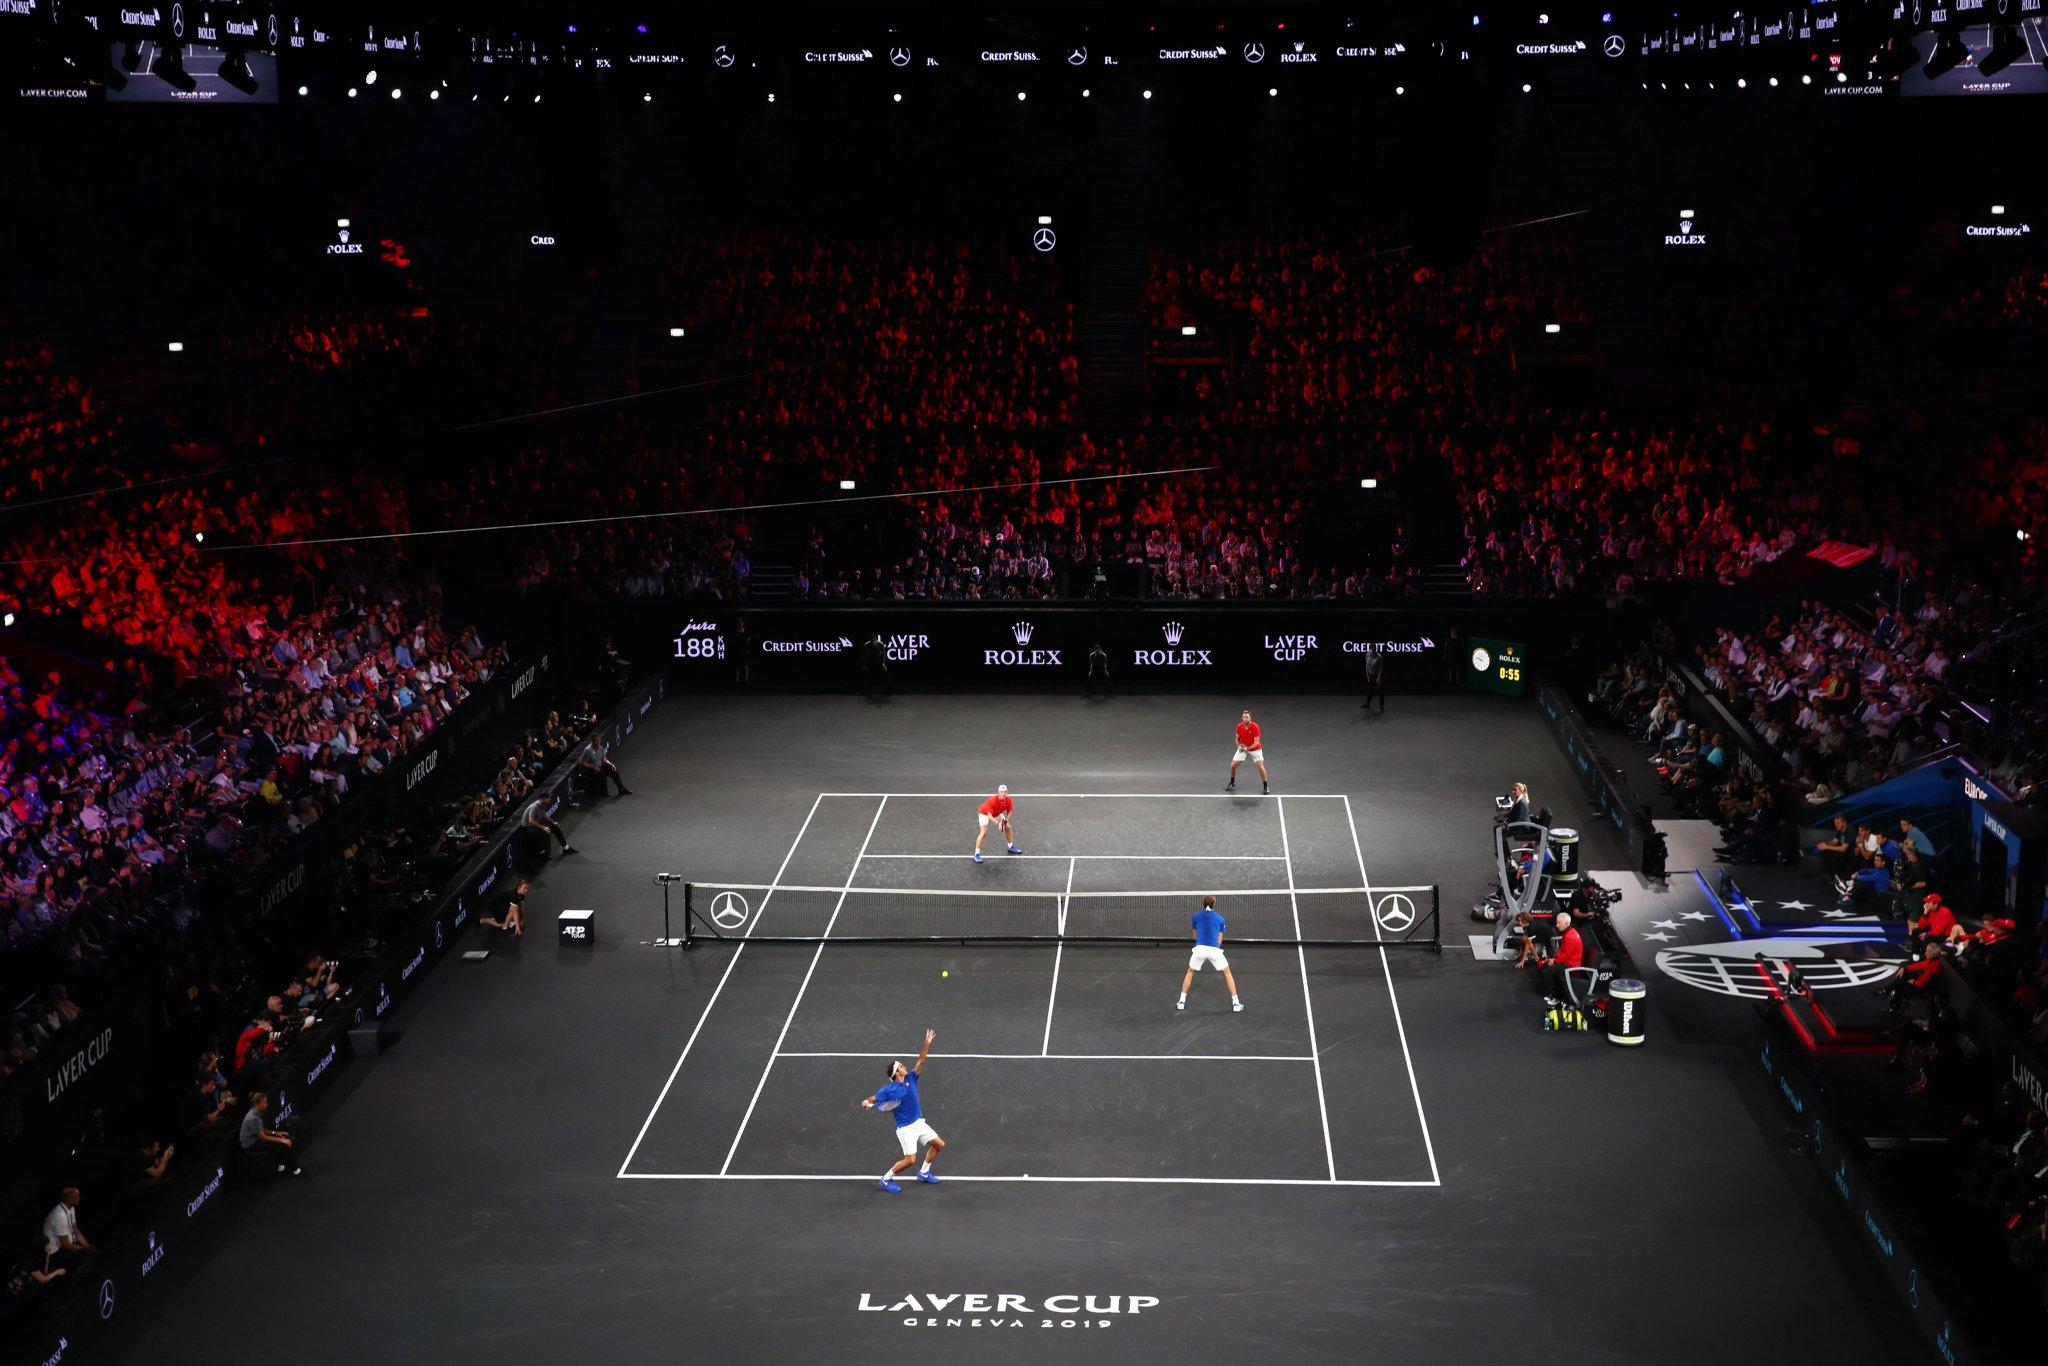 Day 2 of #LaverCup is going to be 🔥  1⃣. Zverev vs. Isner 2⃣. Federer vs. Kyrgios 3⃣. Nadal vs. Raonic 4⃣. Nadal/Tsitsipas vs. Kyrgios/Sock  Which match are you most excited for? https://t.co/R1hGXukbXo